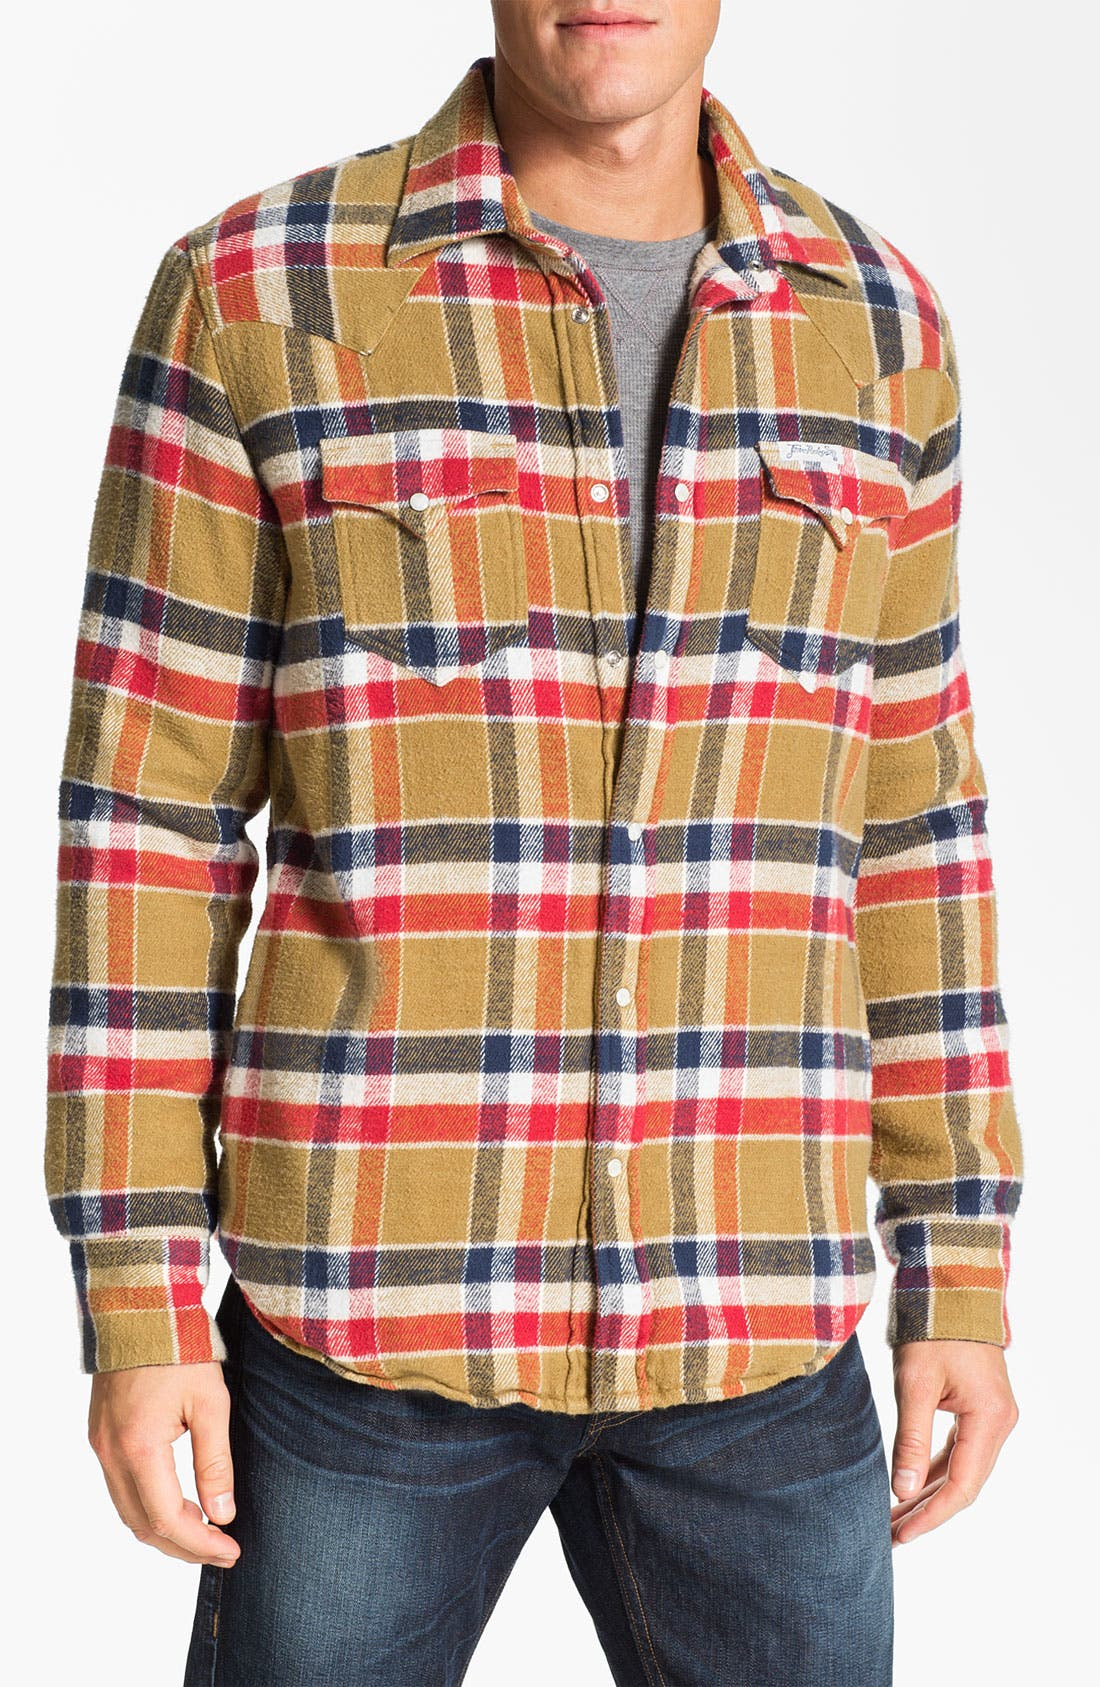 Alternate Image 1 Selected - True Religion Brand Jeans Plaid Flannel Shirt Jacket